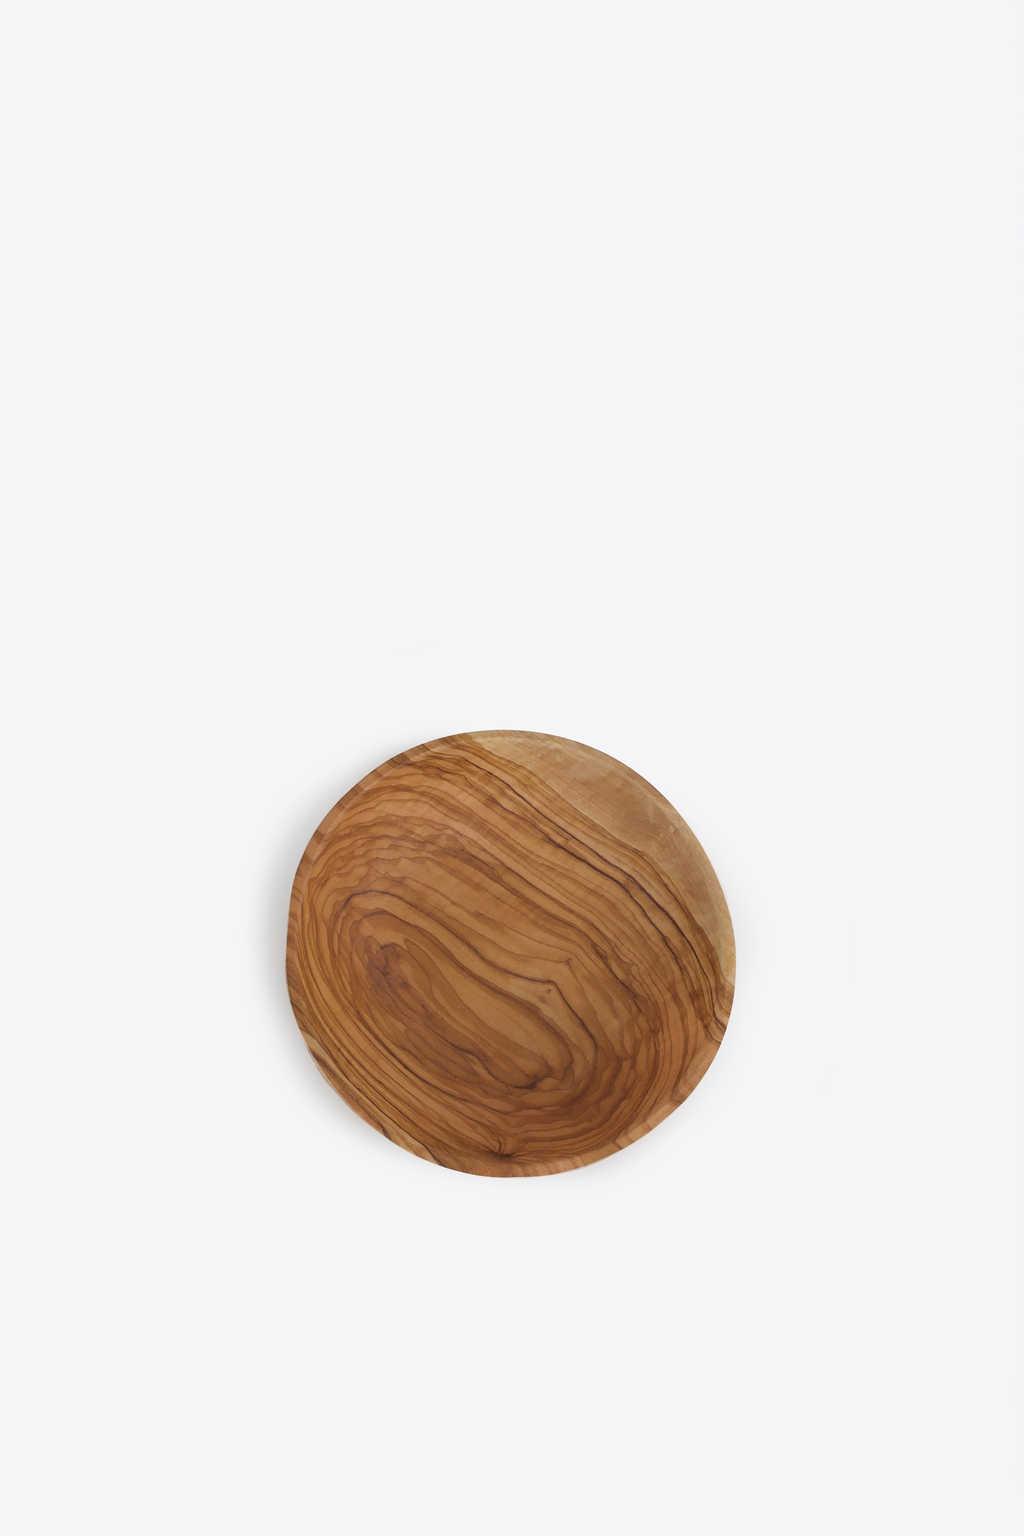 Wood Bowl 2428 Brown 4